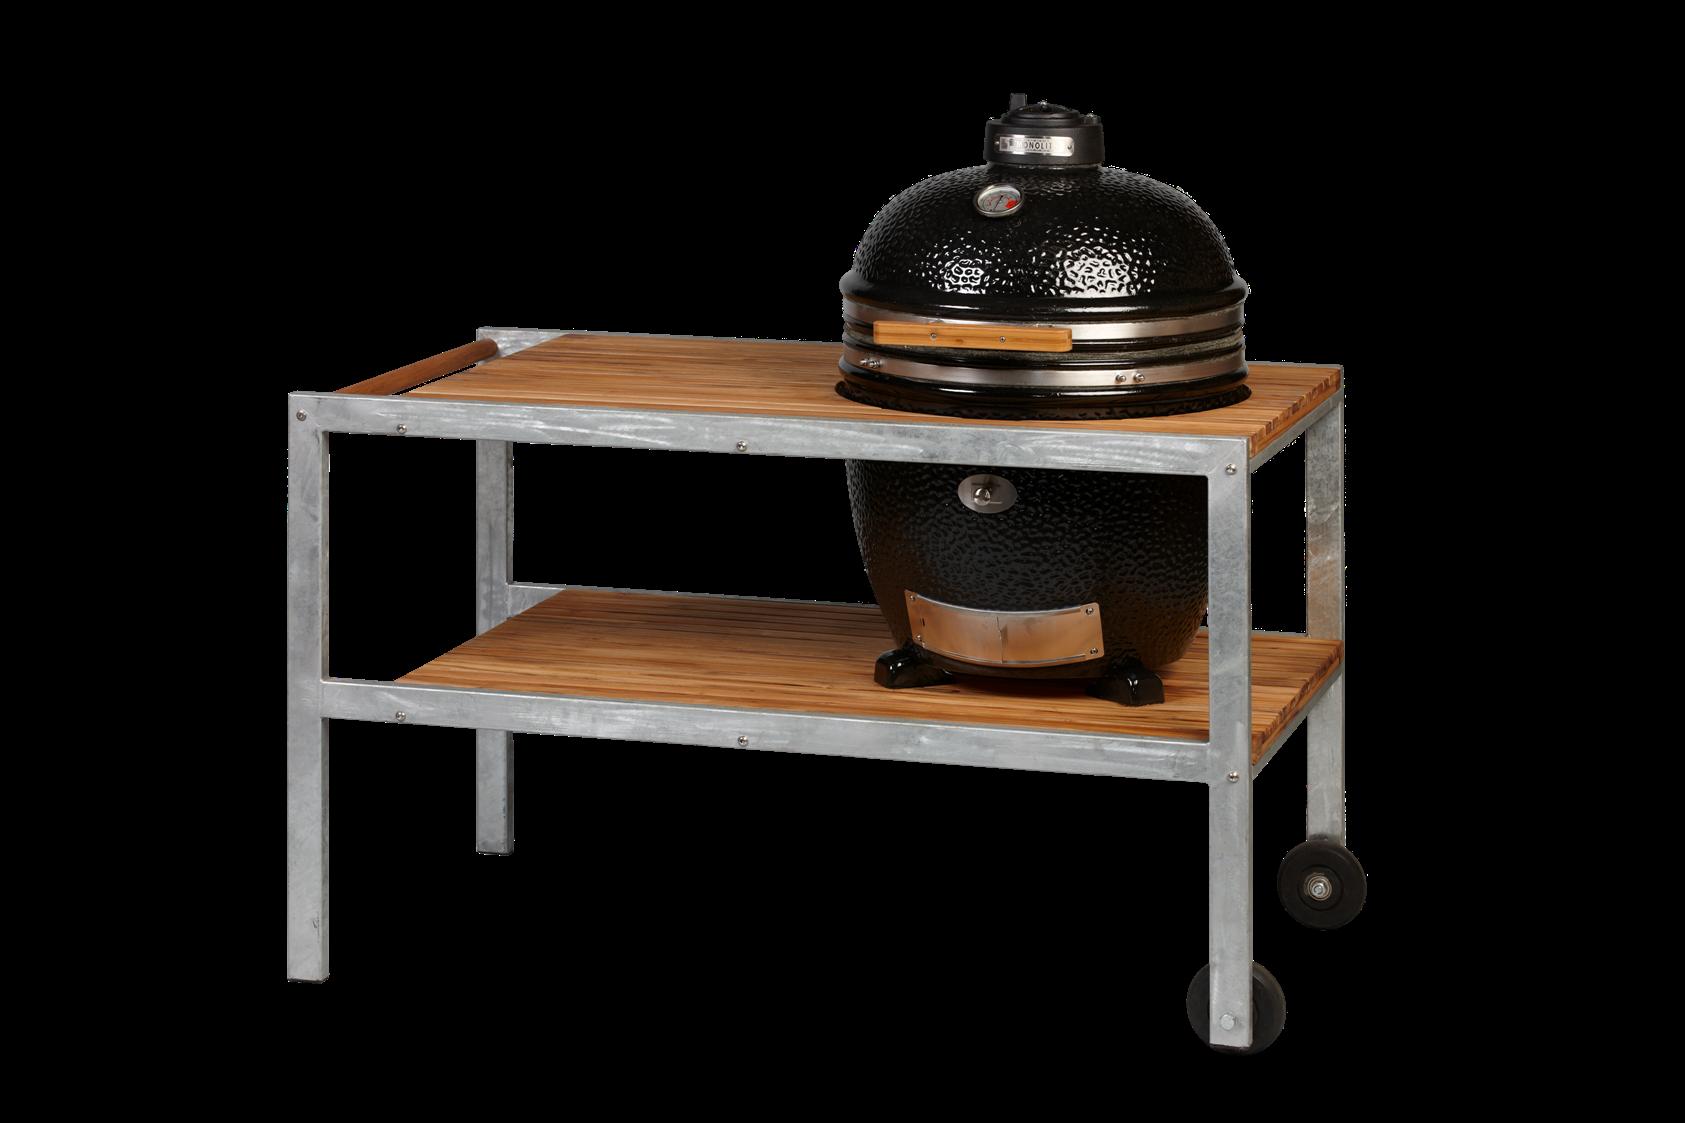 monolith grill exclusive schwarz. Black Bedroom Furniture Sets. Home Design Ideas